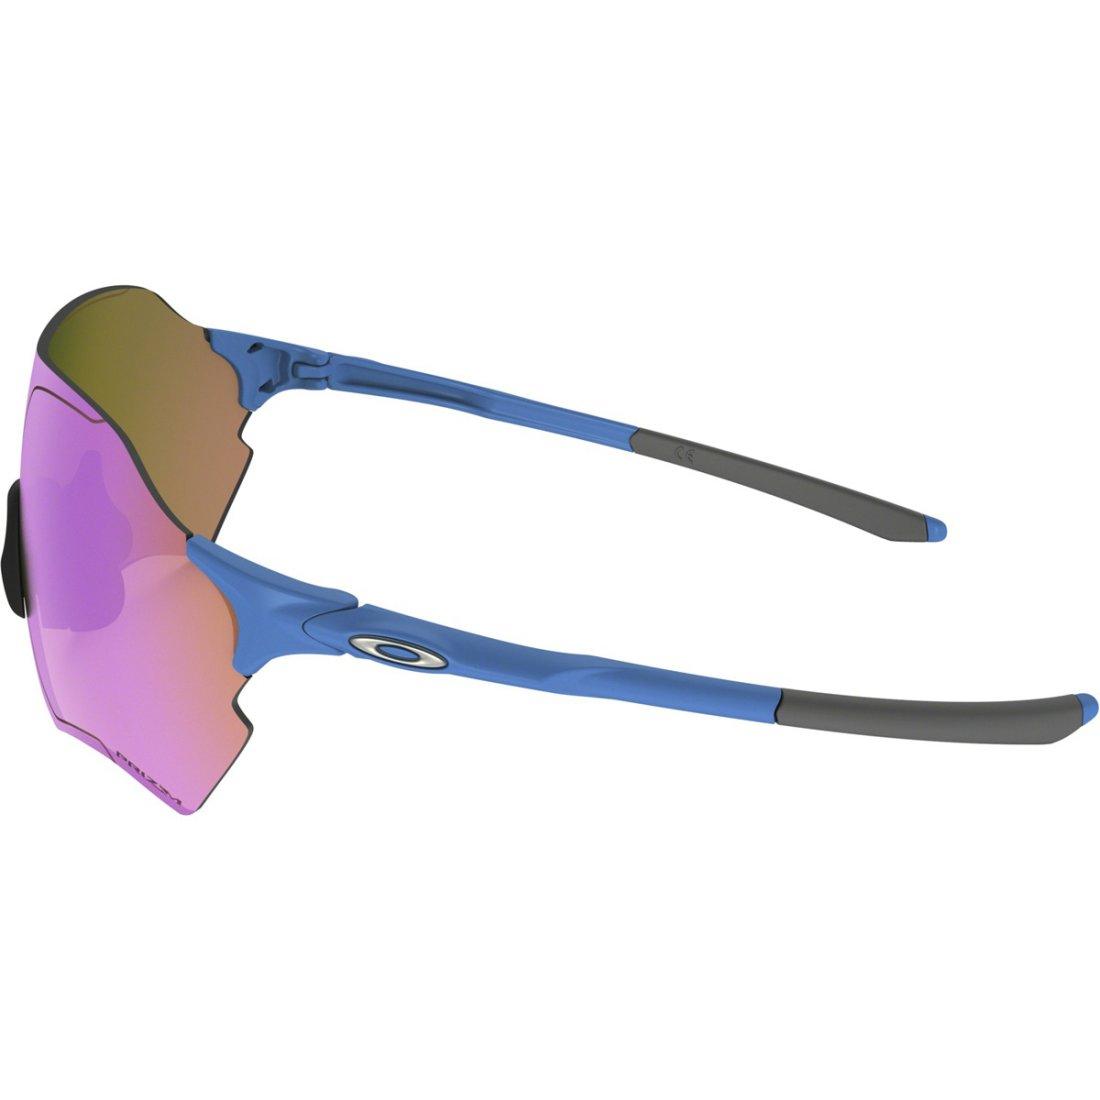 173fc0b783 OAKLEY EVZero Ranger Matte Sky Blue   Prizm Trail Mask   Goggle ...